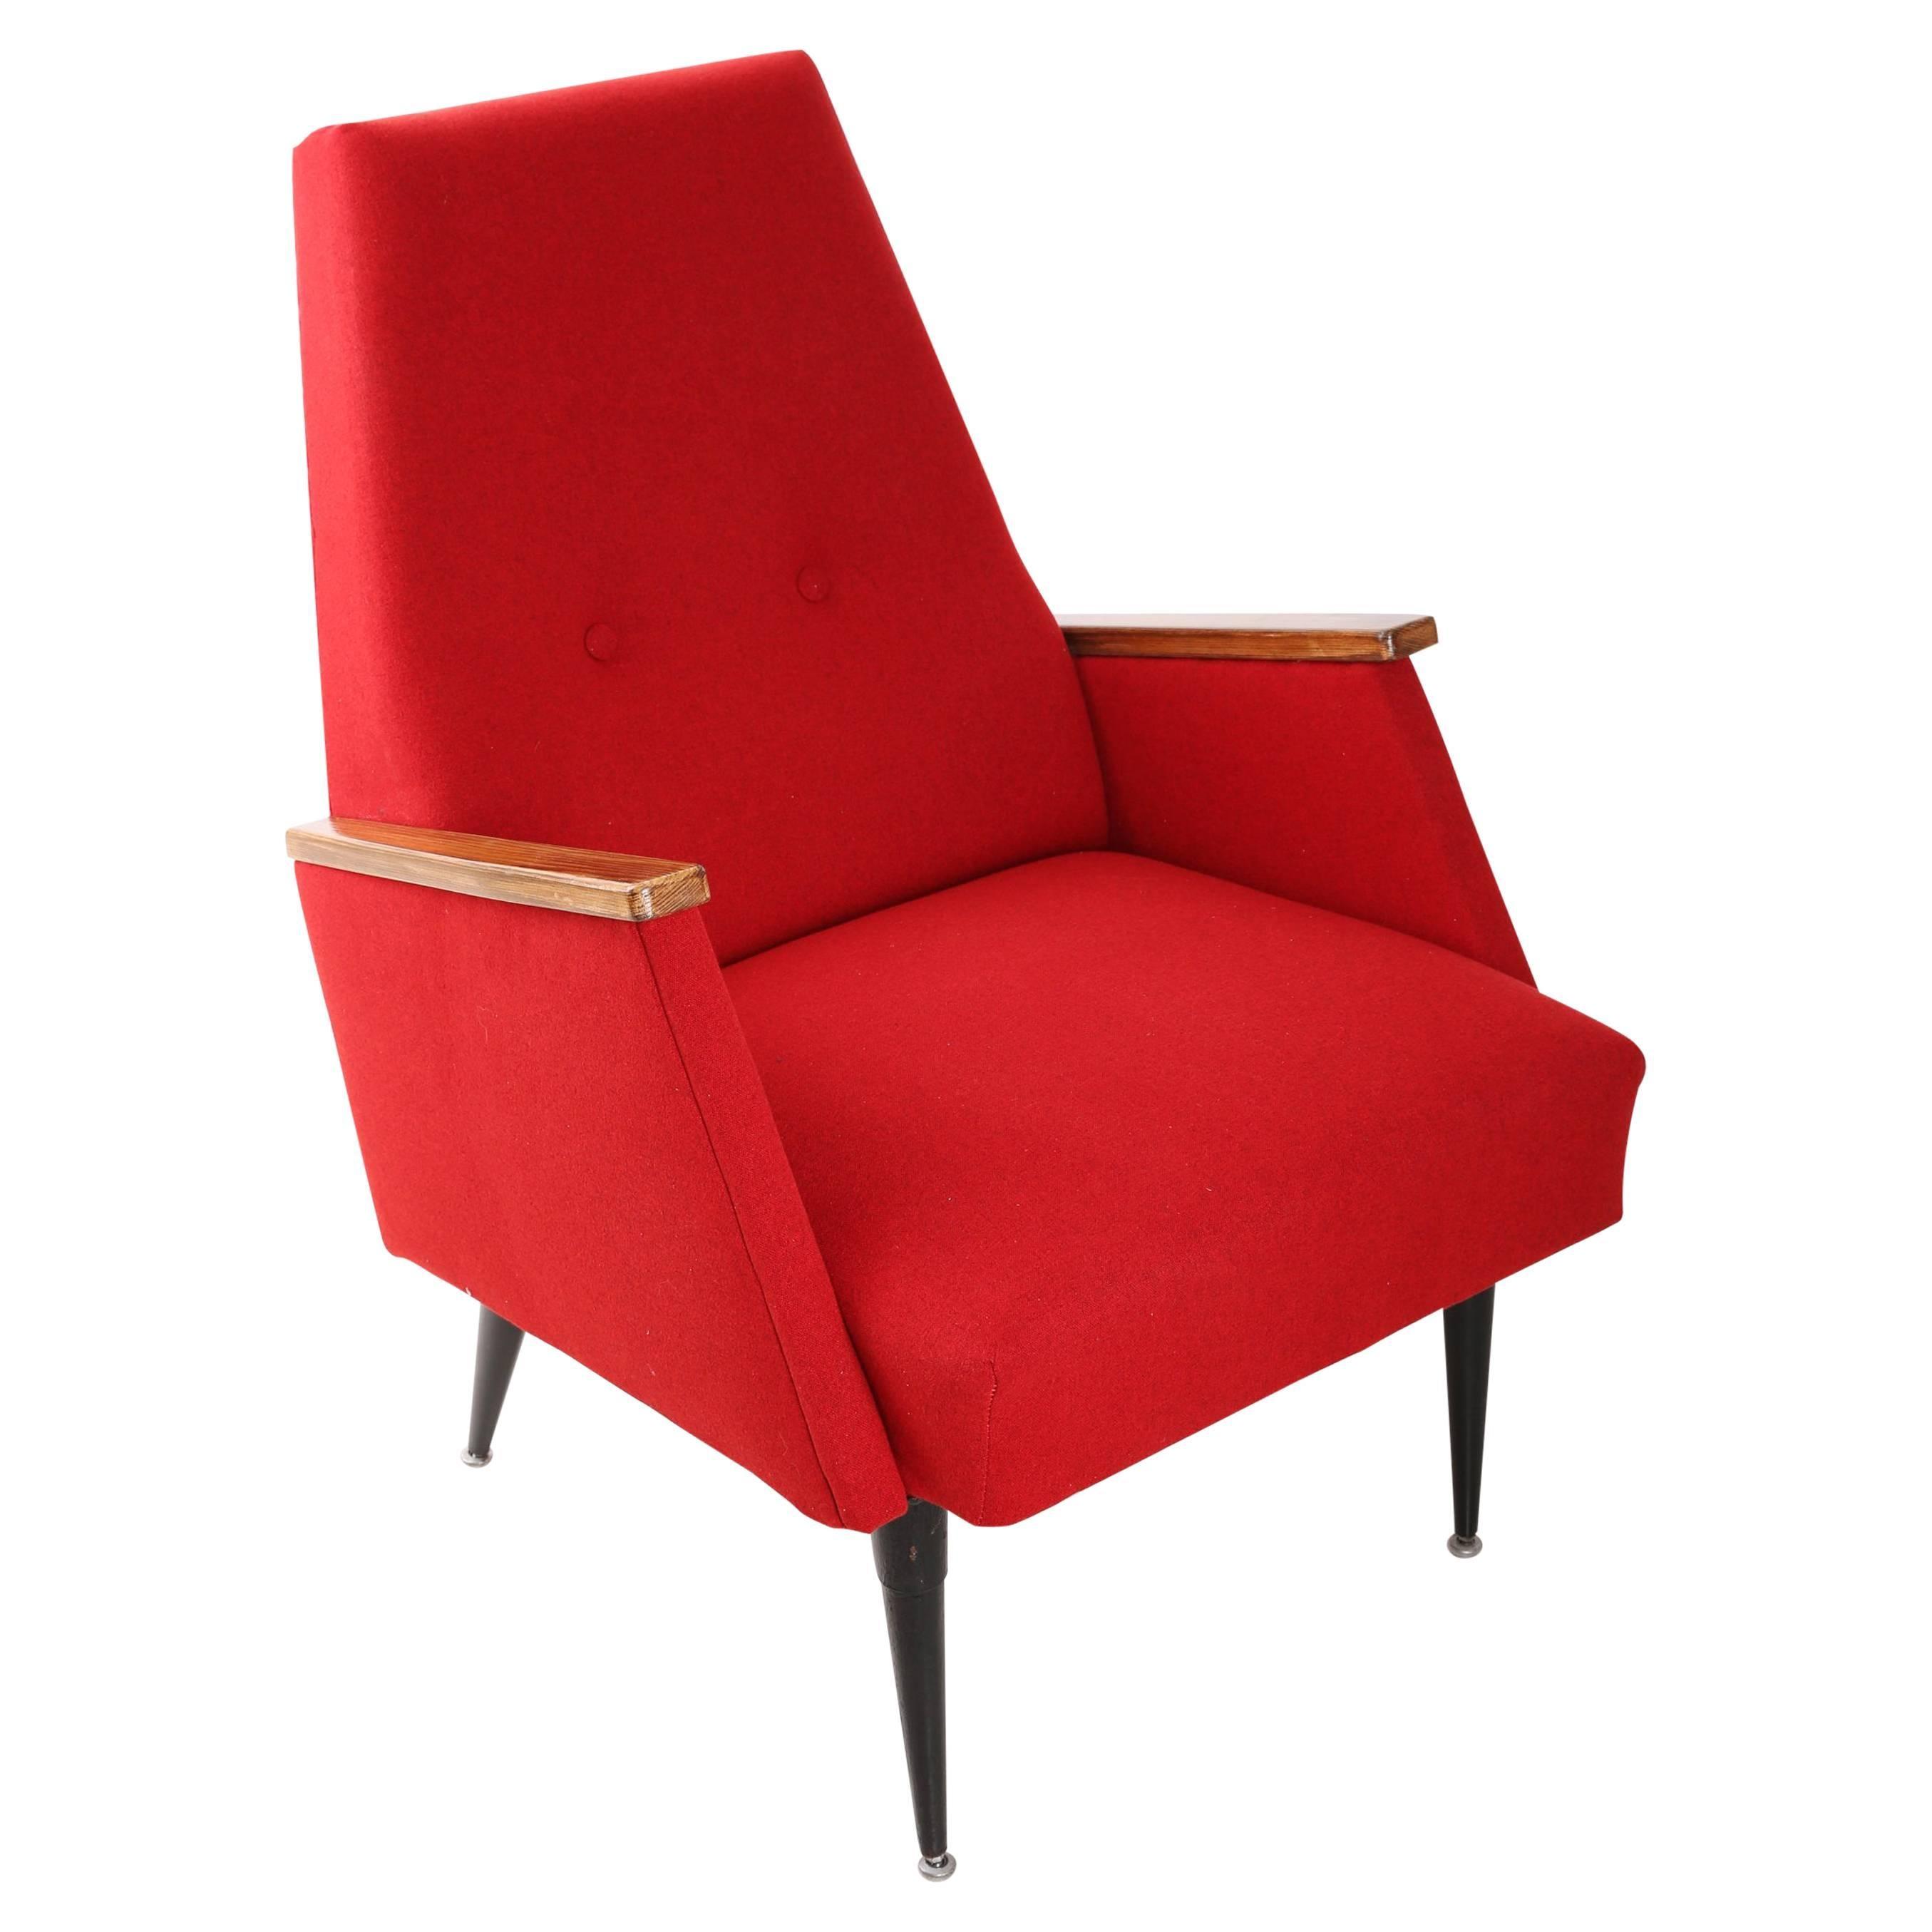 Charmant Art Deco, Vintage Red Big Armchair, 1960s